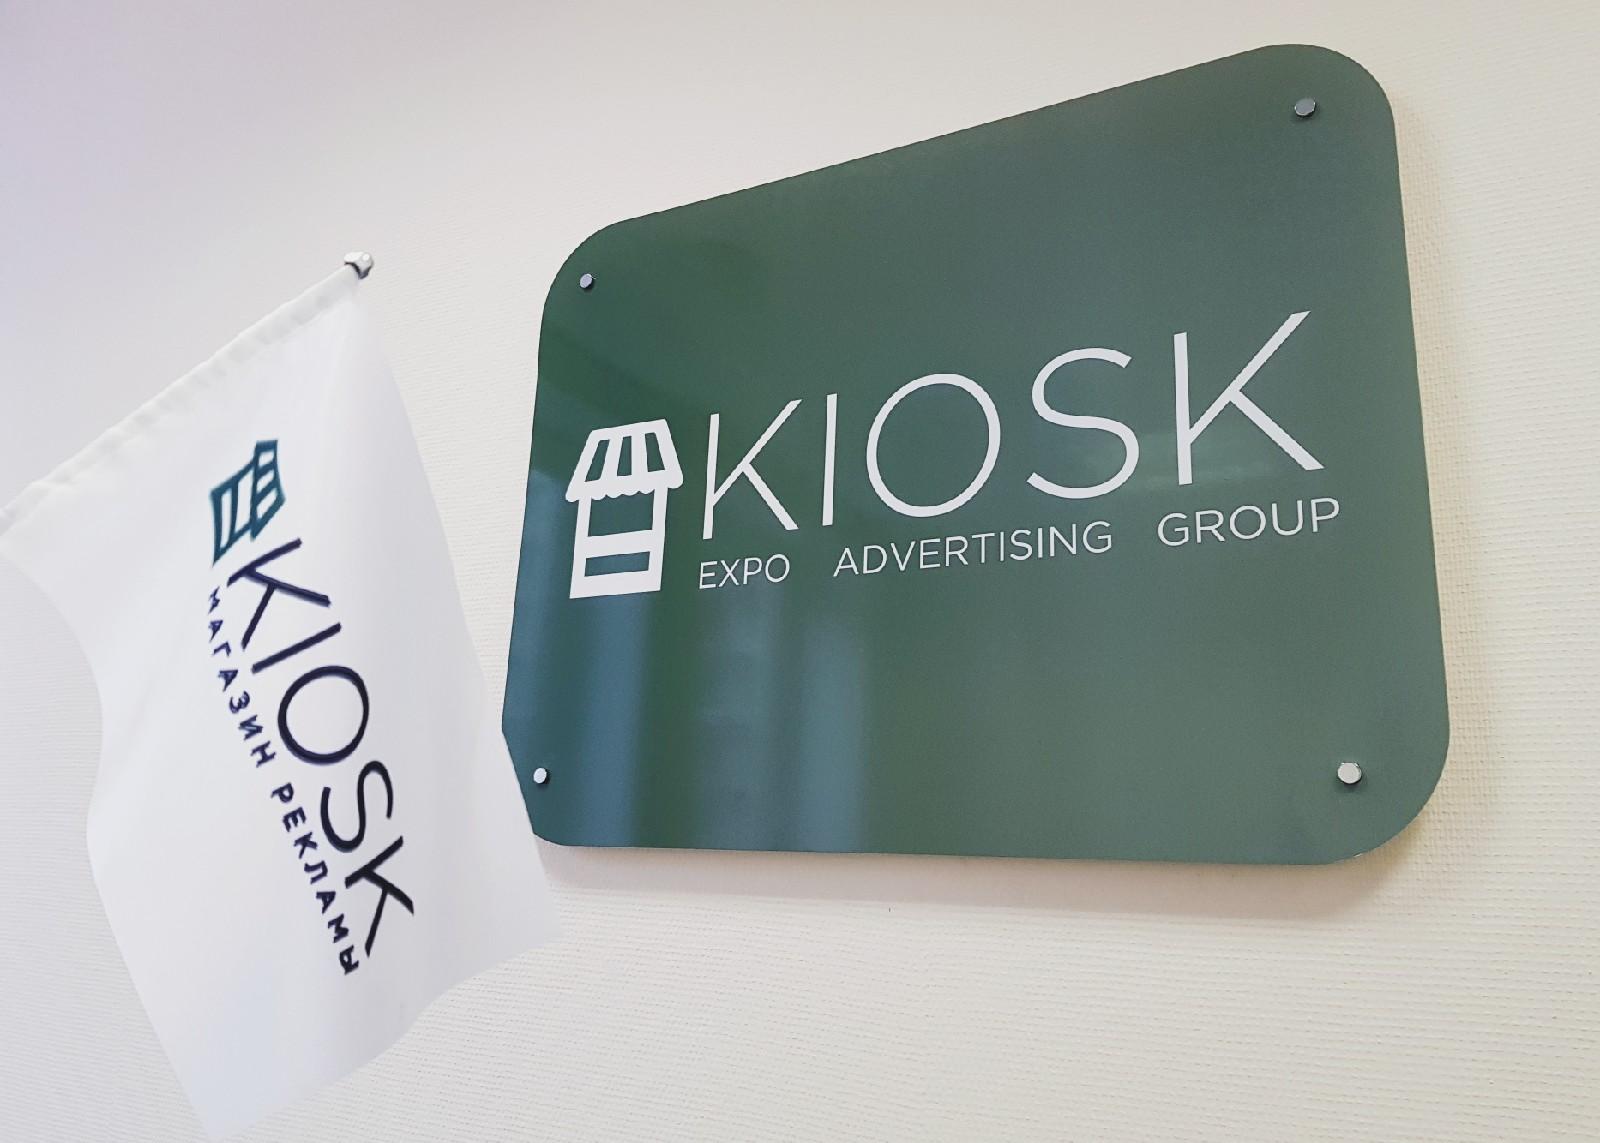 Рекламно-выставочная компания KIOSK